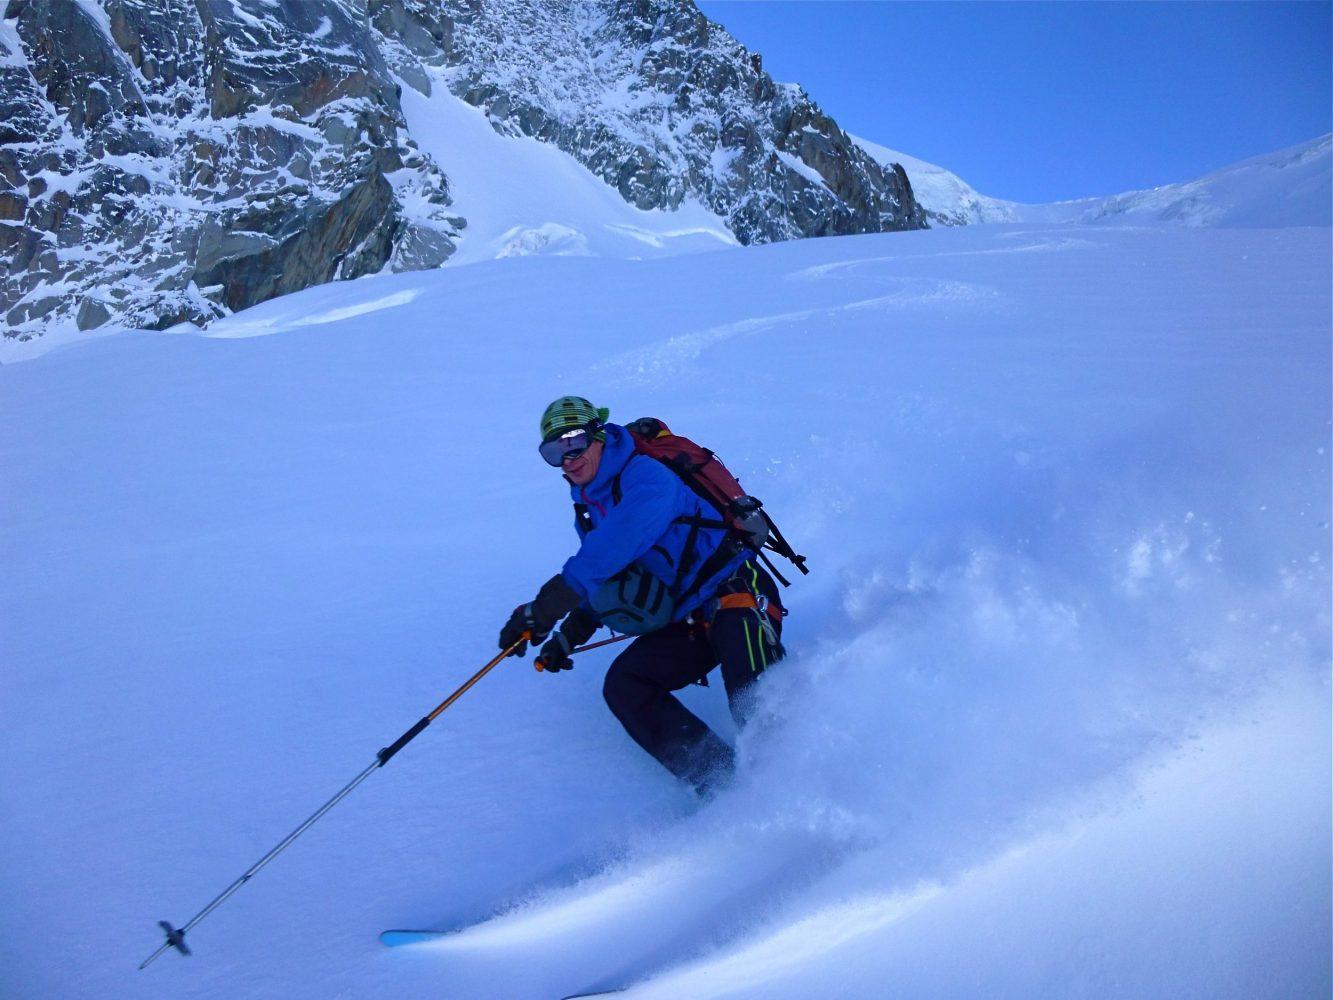 Vallée Blanche, Aiguille du Midi, Mountaineering course, Chamonix ski guide, haute route, chamonix climbing, Chamonix freeride, Chamonix mountain guides, Swiss mountaineering